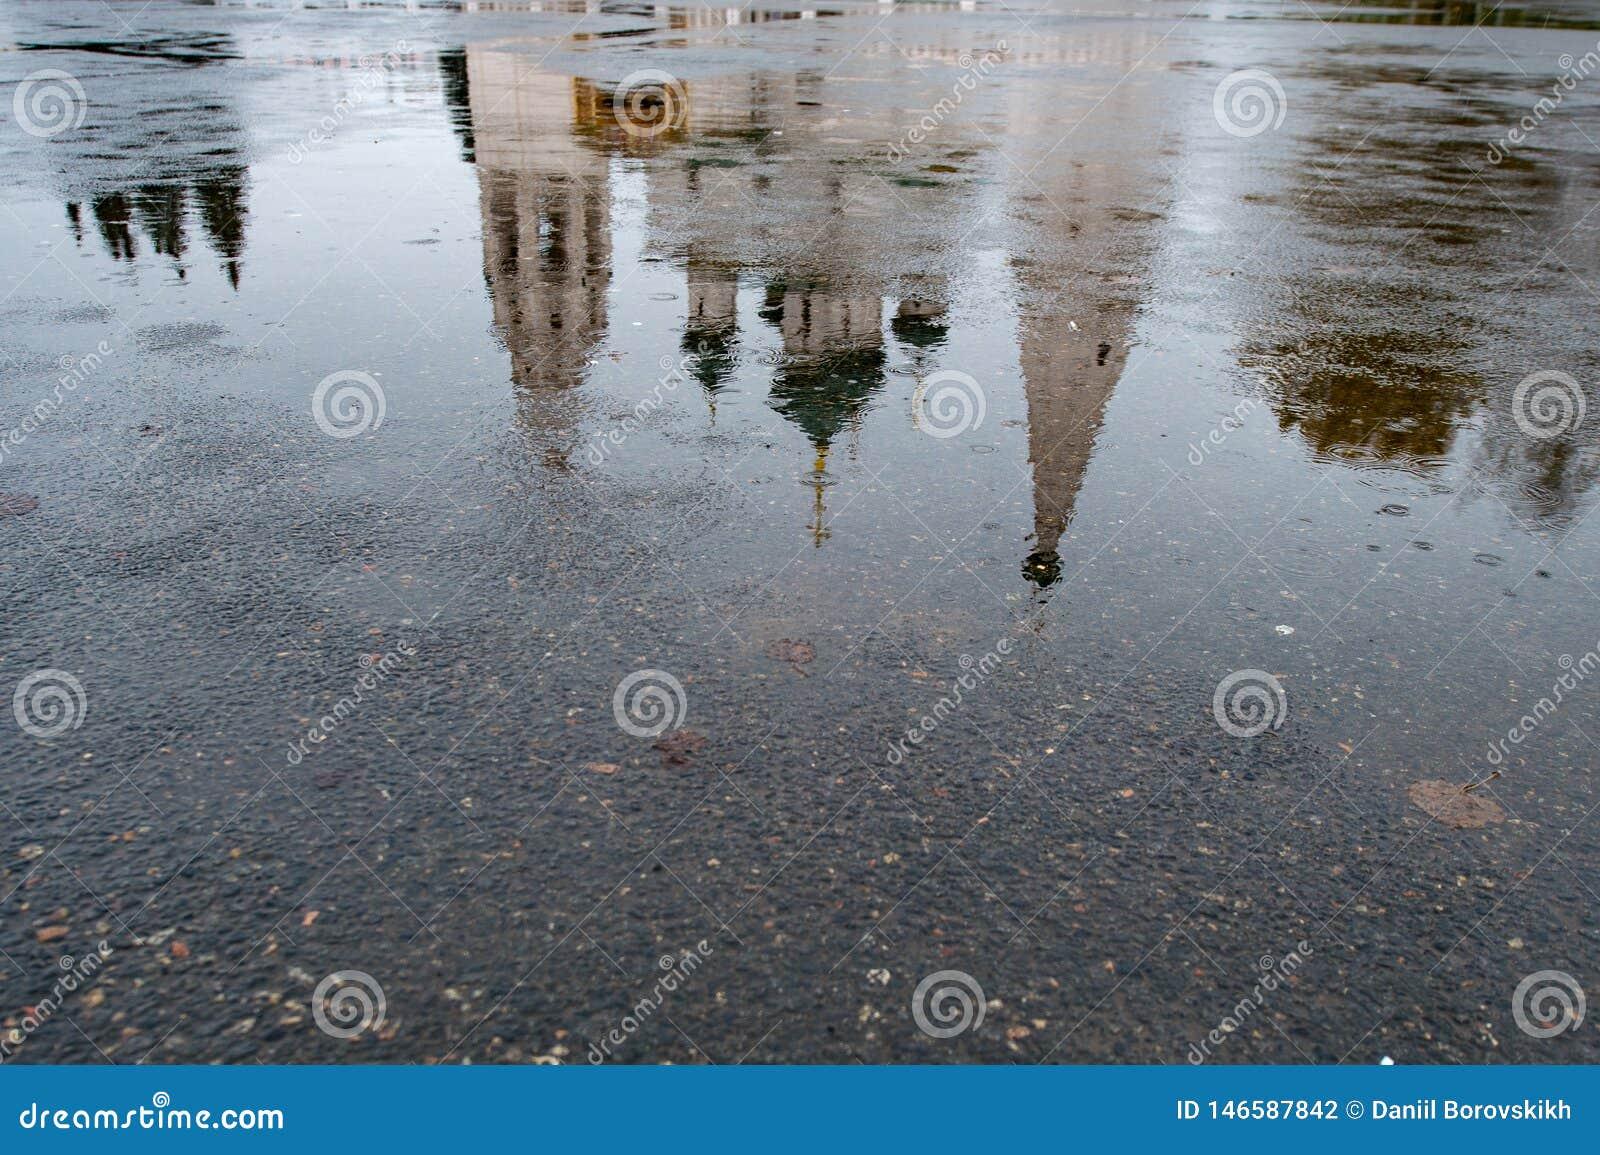 Reflection of Church in asphalt